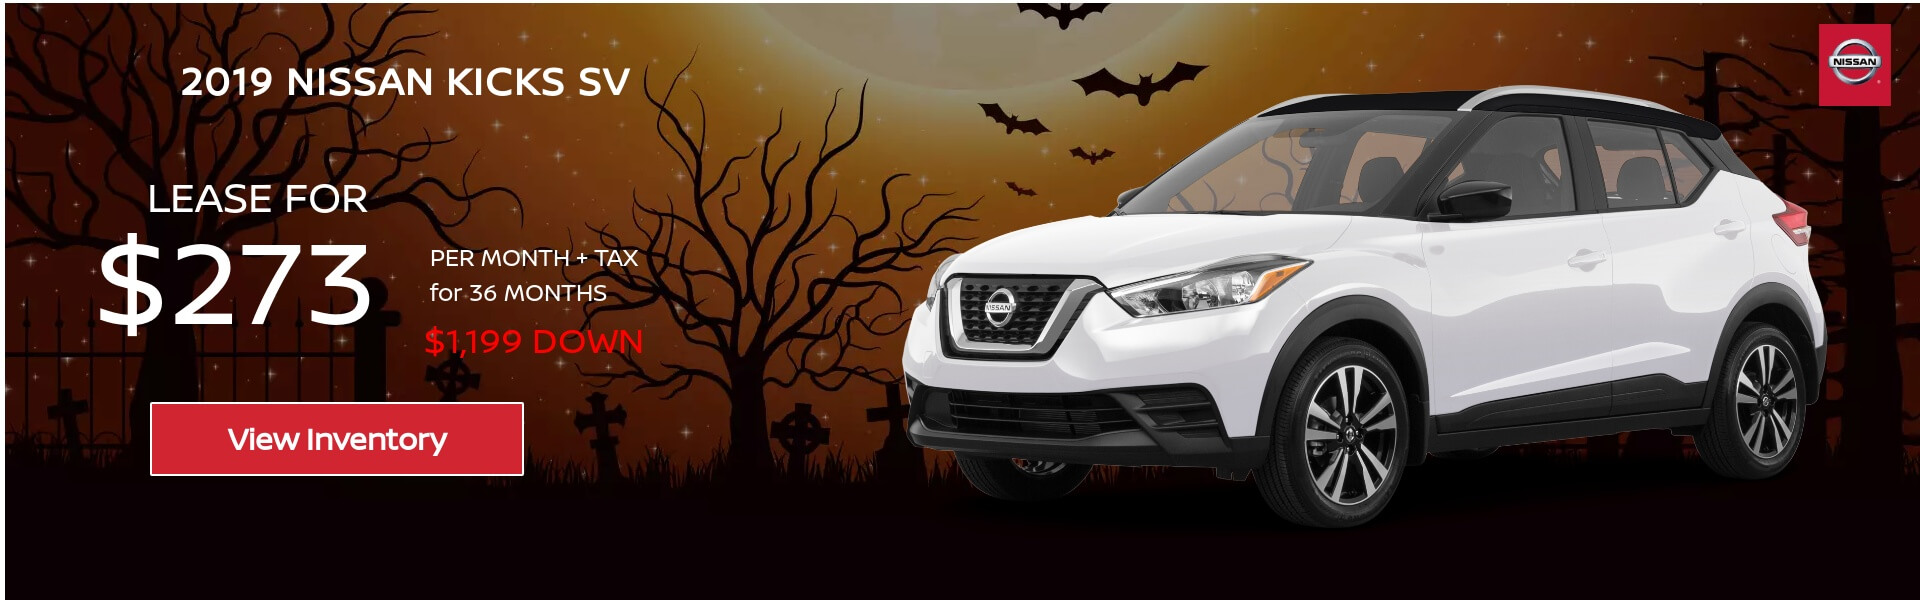 Nissan Kicks $273 Lease